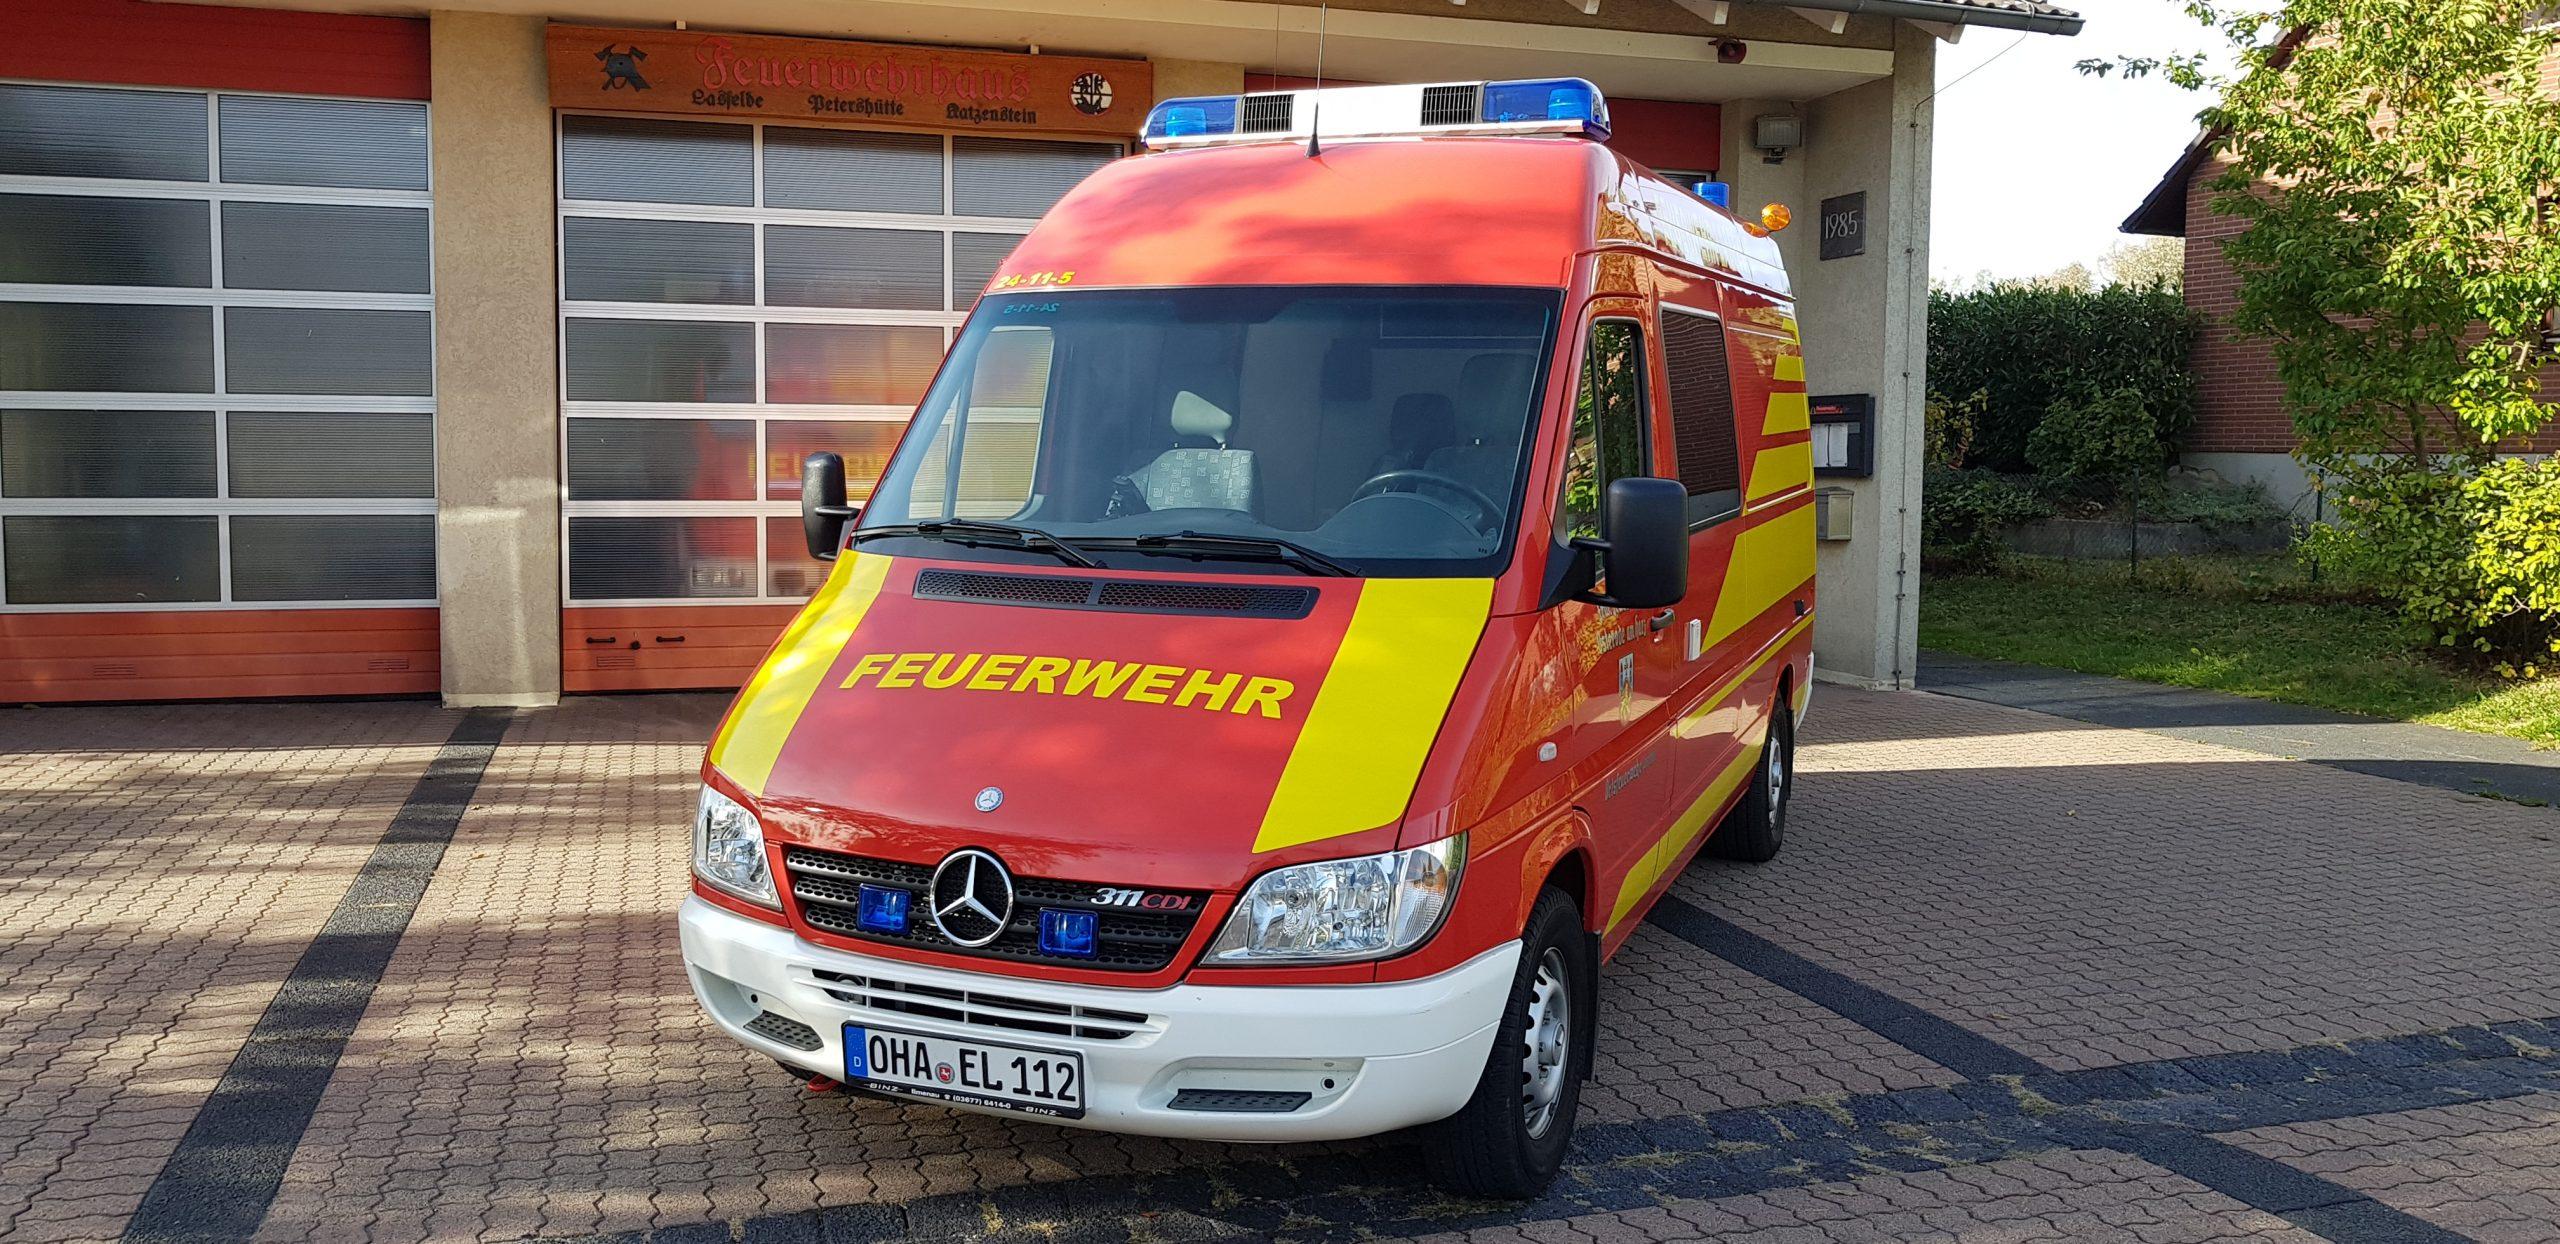 #0014 - ELW Feuerwehr Osterode Ortsfeuerwehr Lasfelde